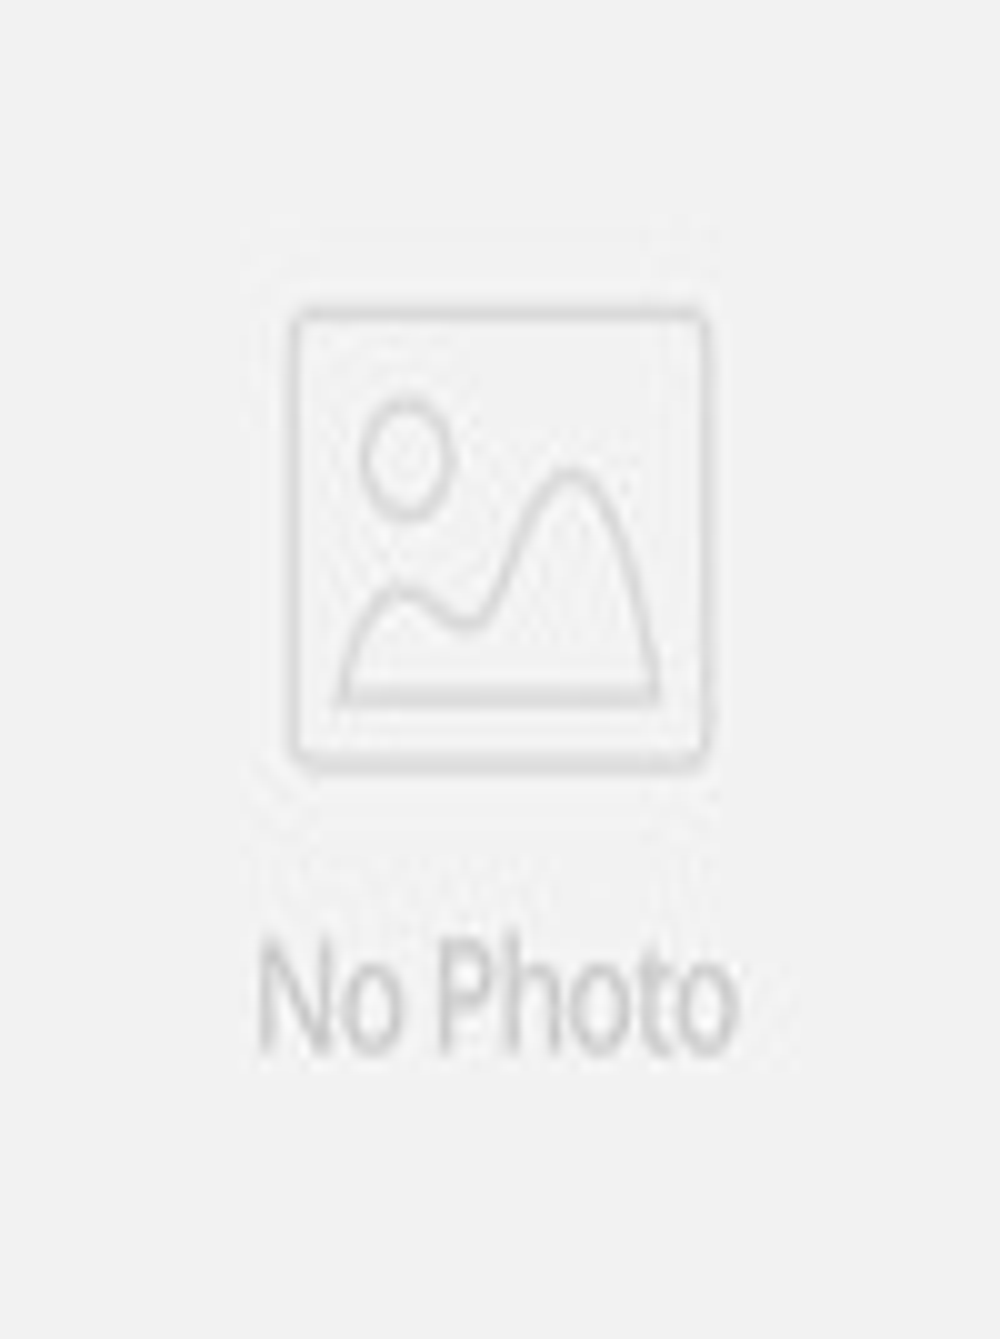 Replacment for Big Green Egg MINI Kamado Grill(China (Mainland))